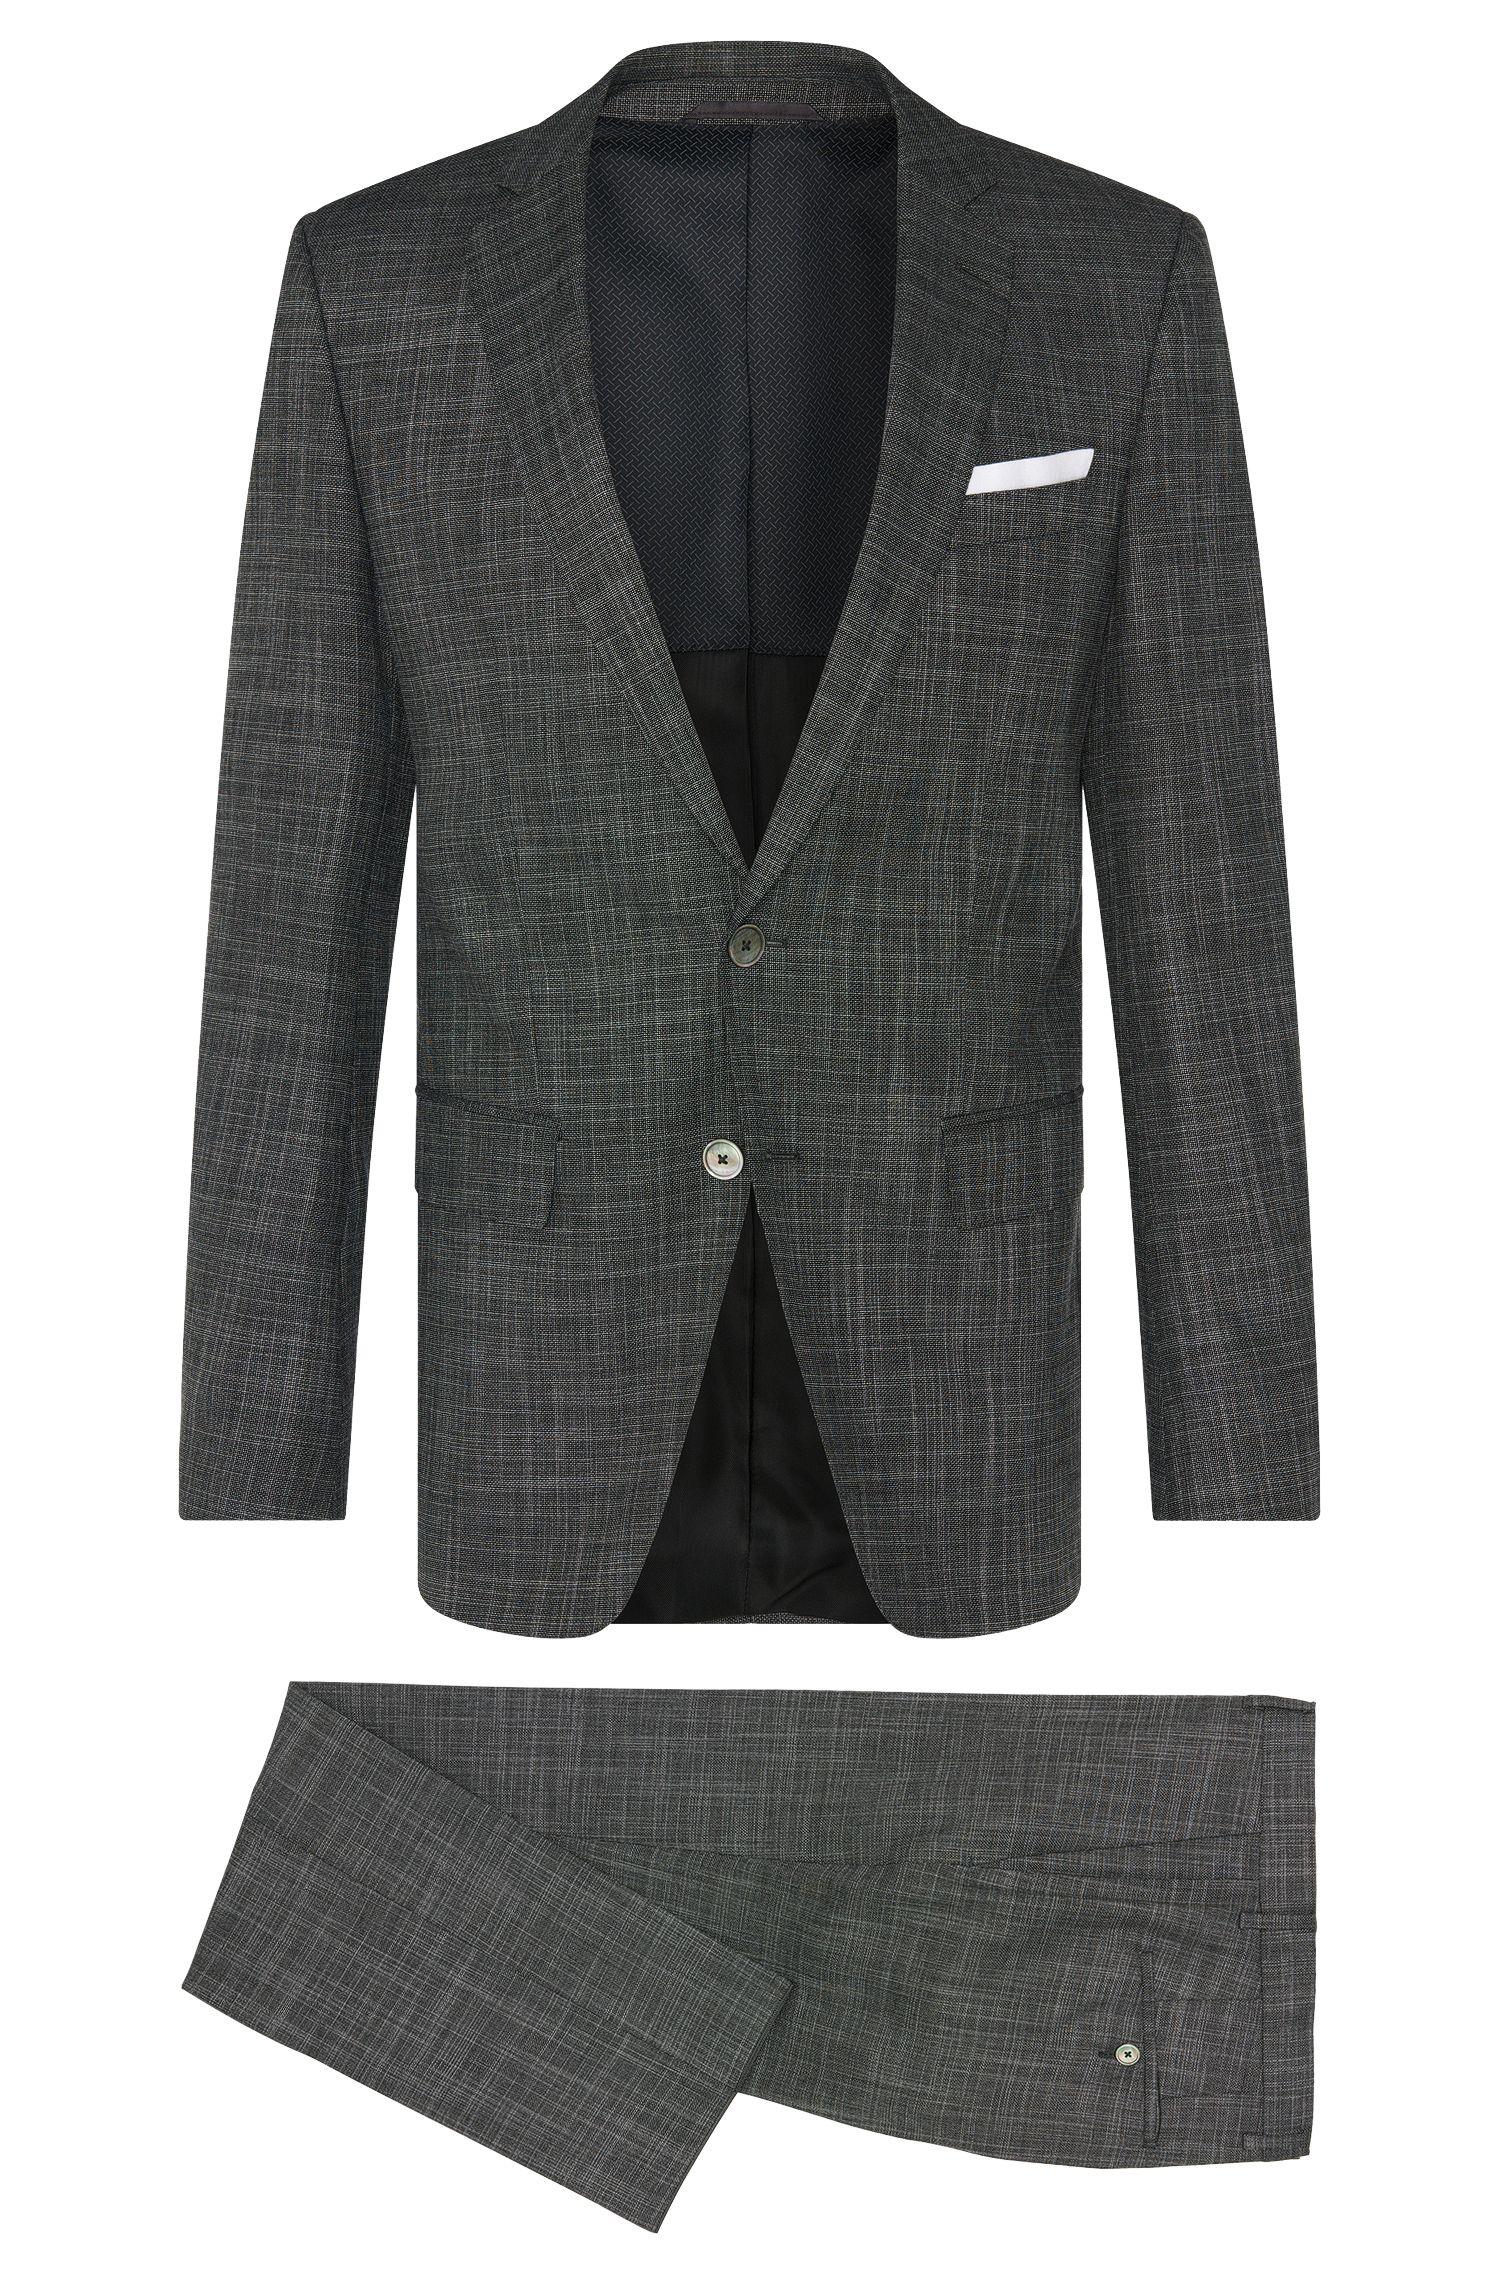 Crosshatch Virgin Wool Blend 3-Piece Suit, Slim Fit | Hutson/Gander WE